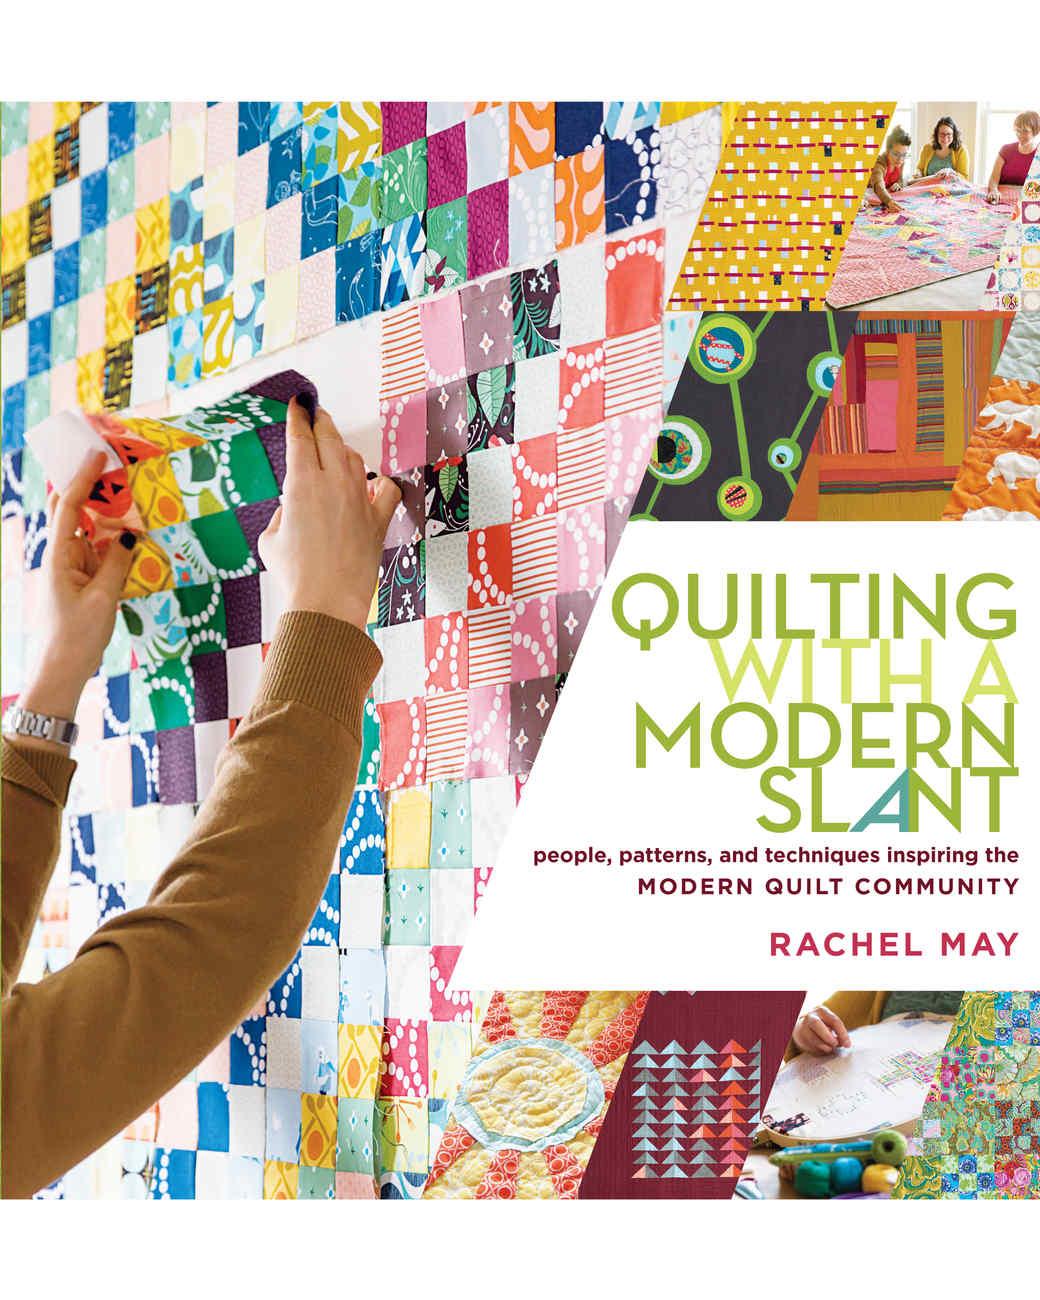 quilting-modern-slant-book-cover-0314.jpg